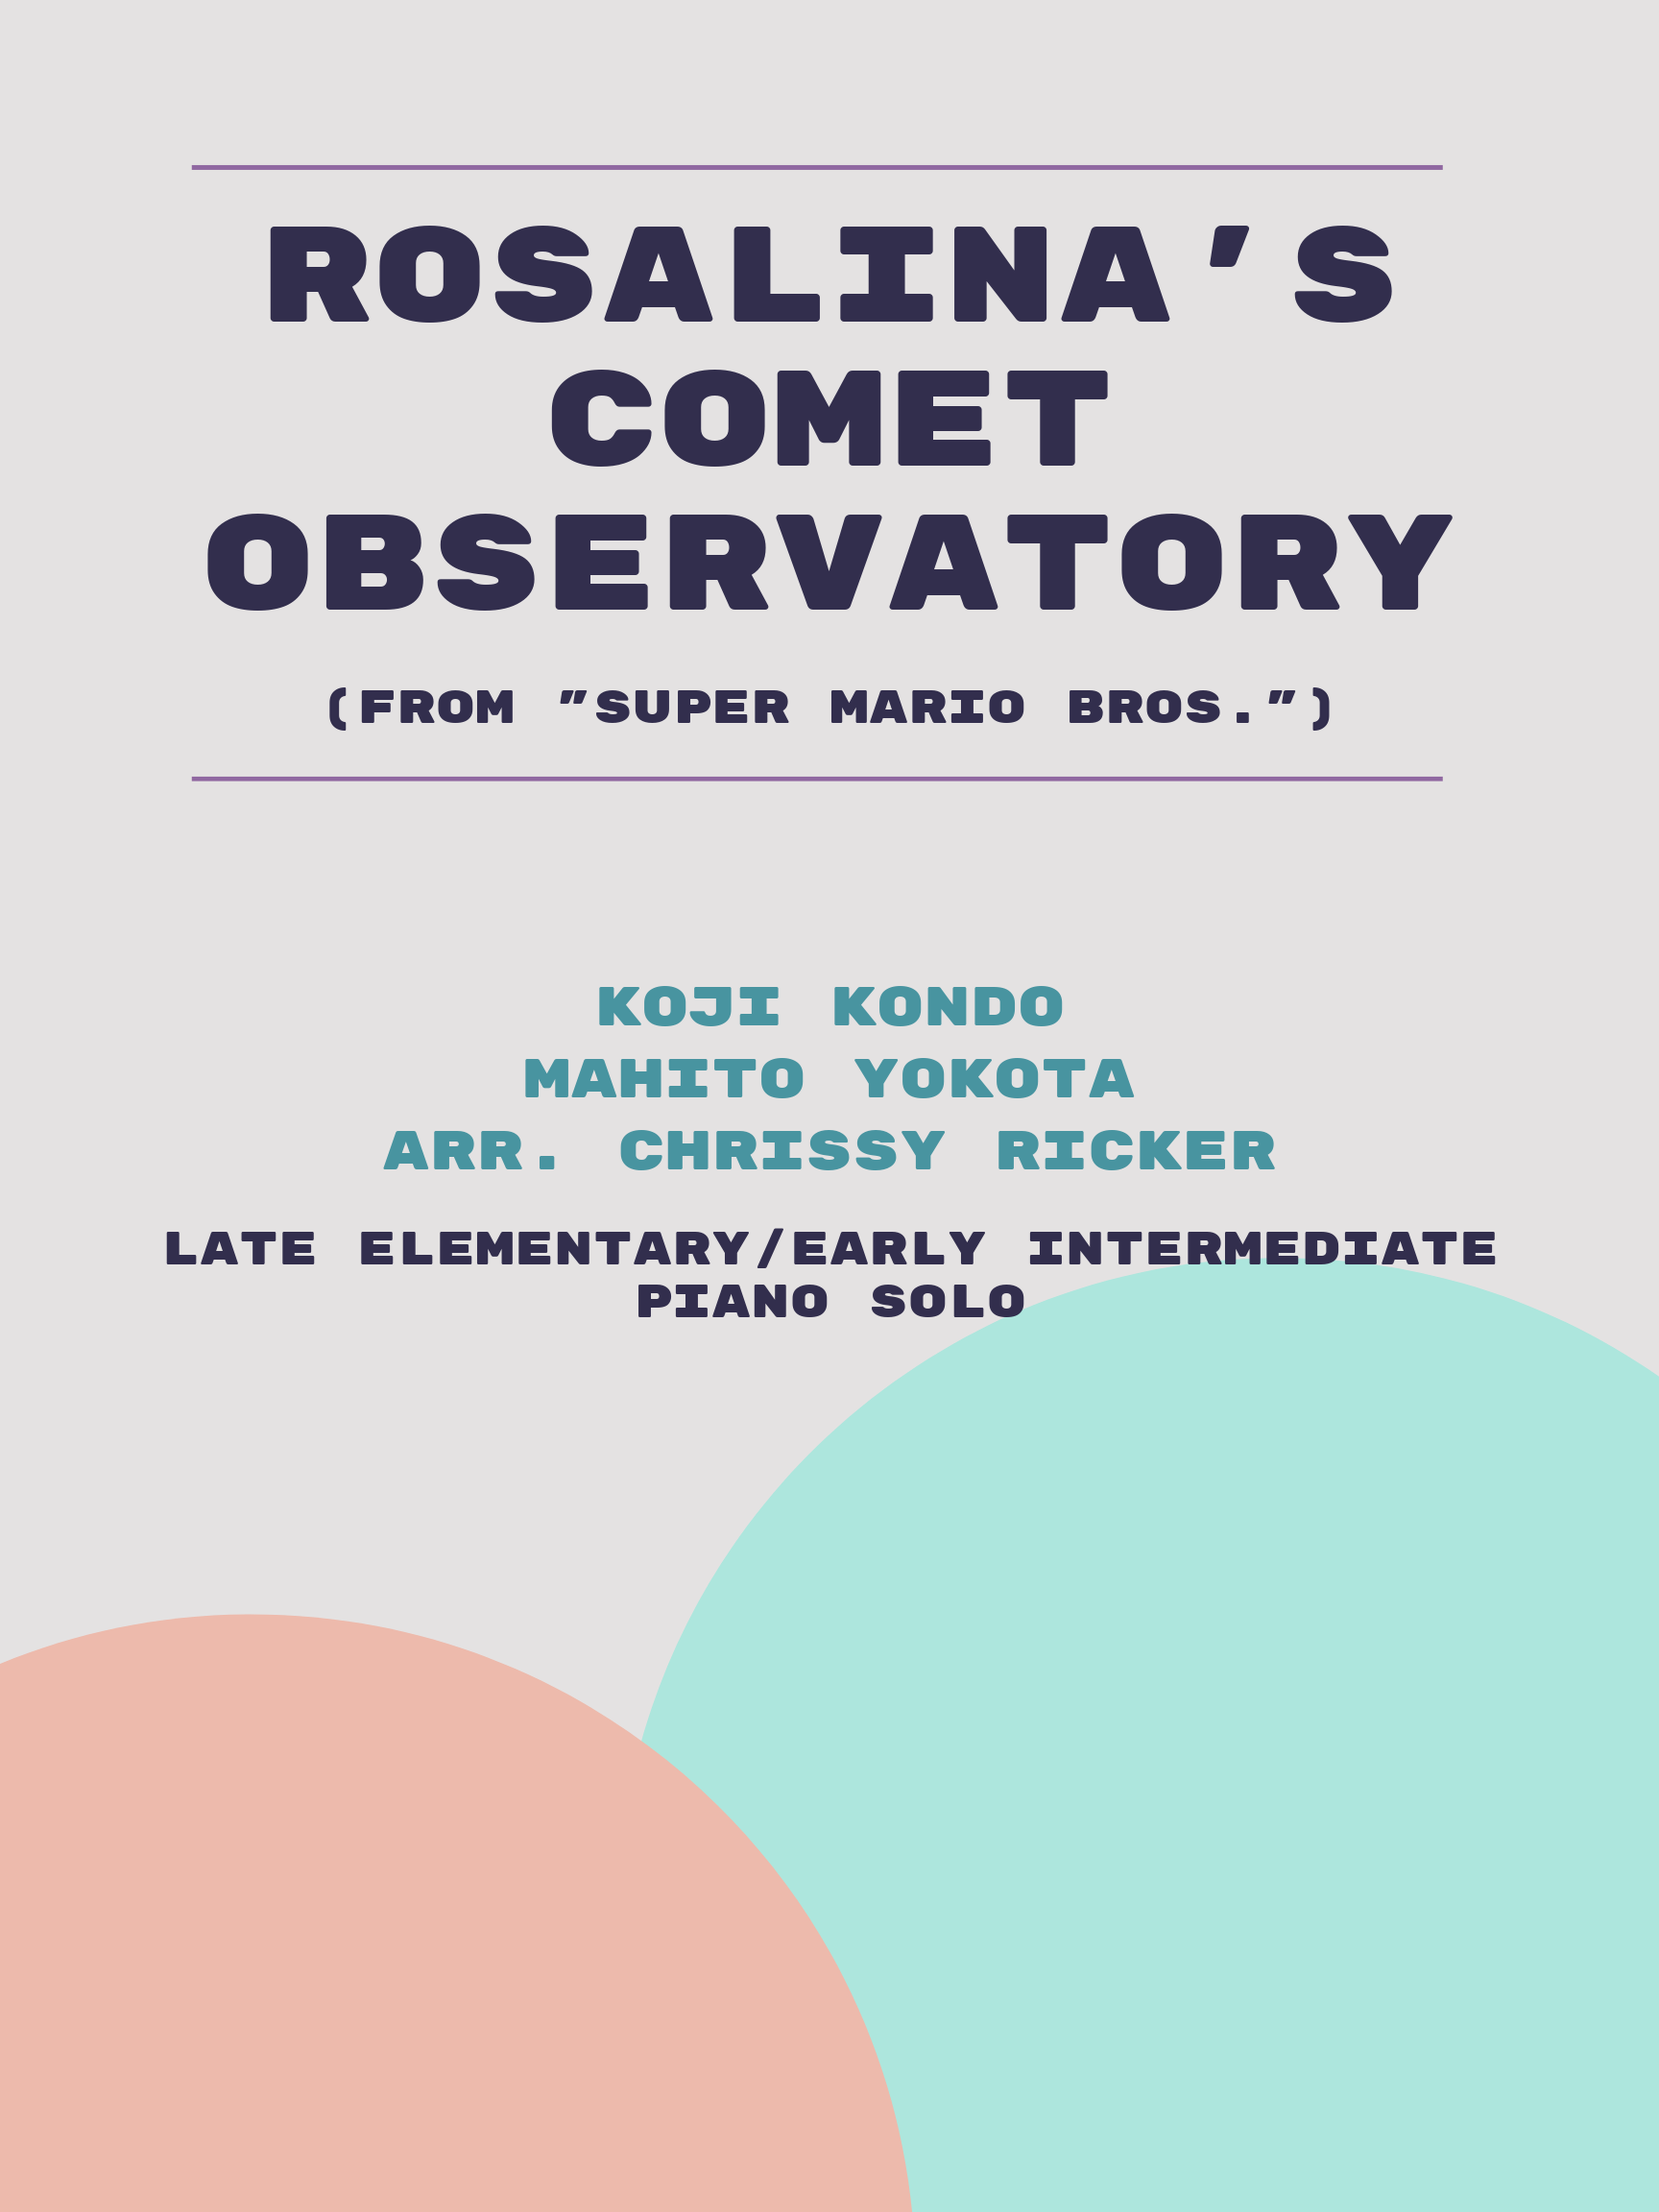 Rosalina's Comet Observatory by Koji Kondo, Mahito Yokota